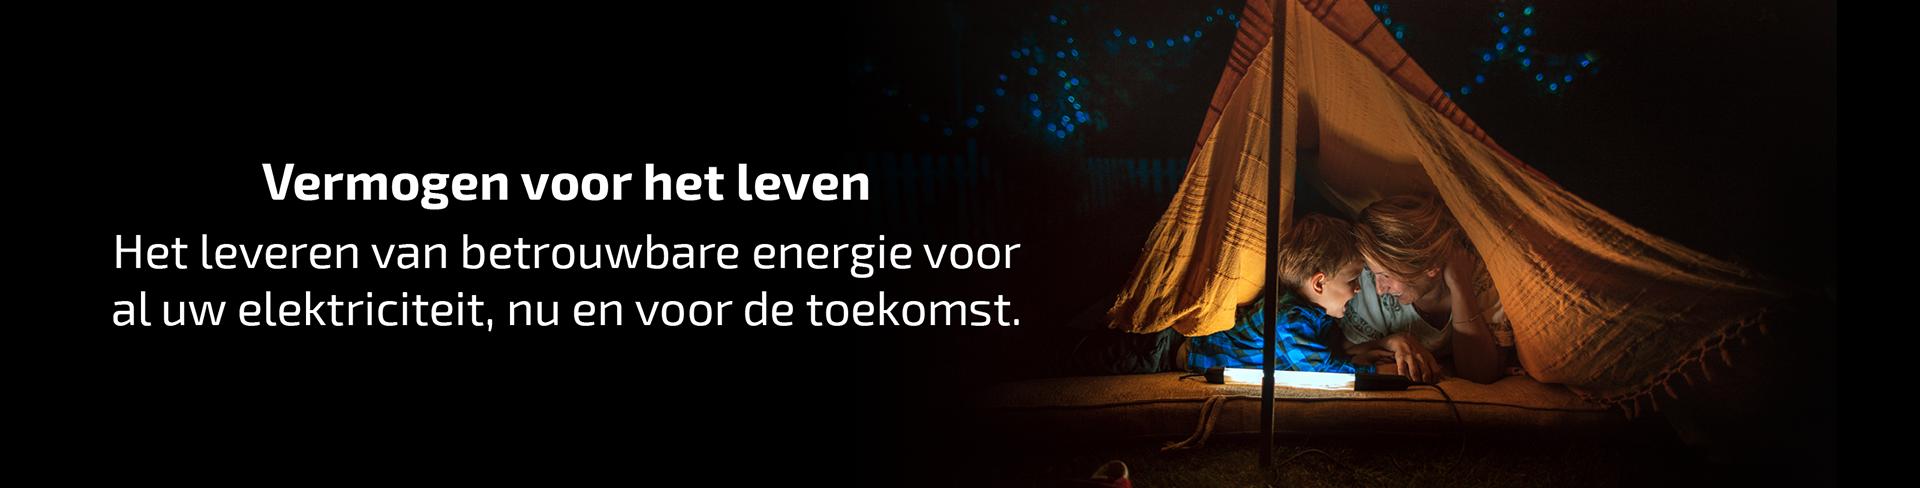 Homepage slideshow NL